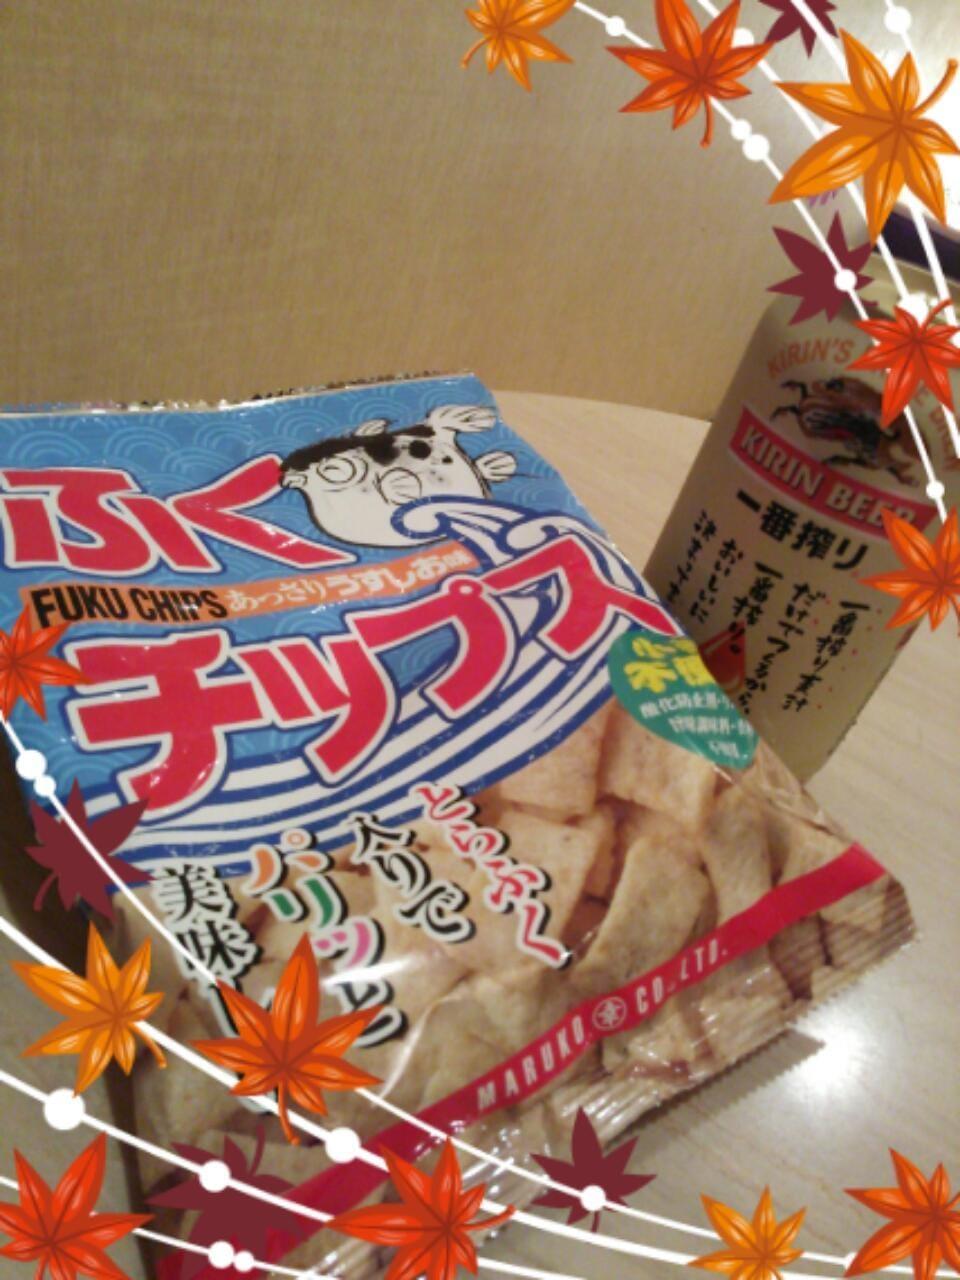 「o(*⌒―⌒*)o」09/07(金) 19:01 | みゆの写メ・風俗動画